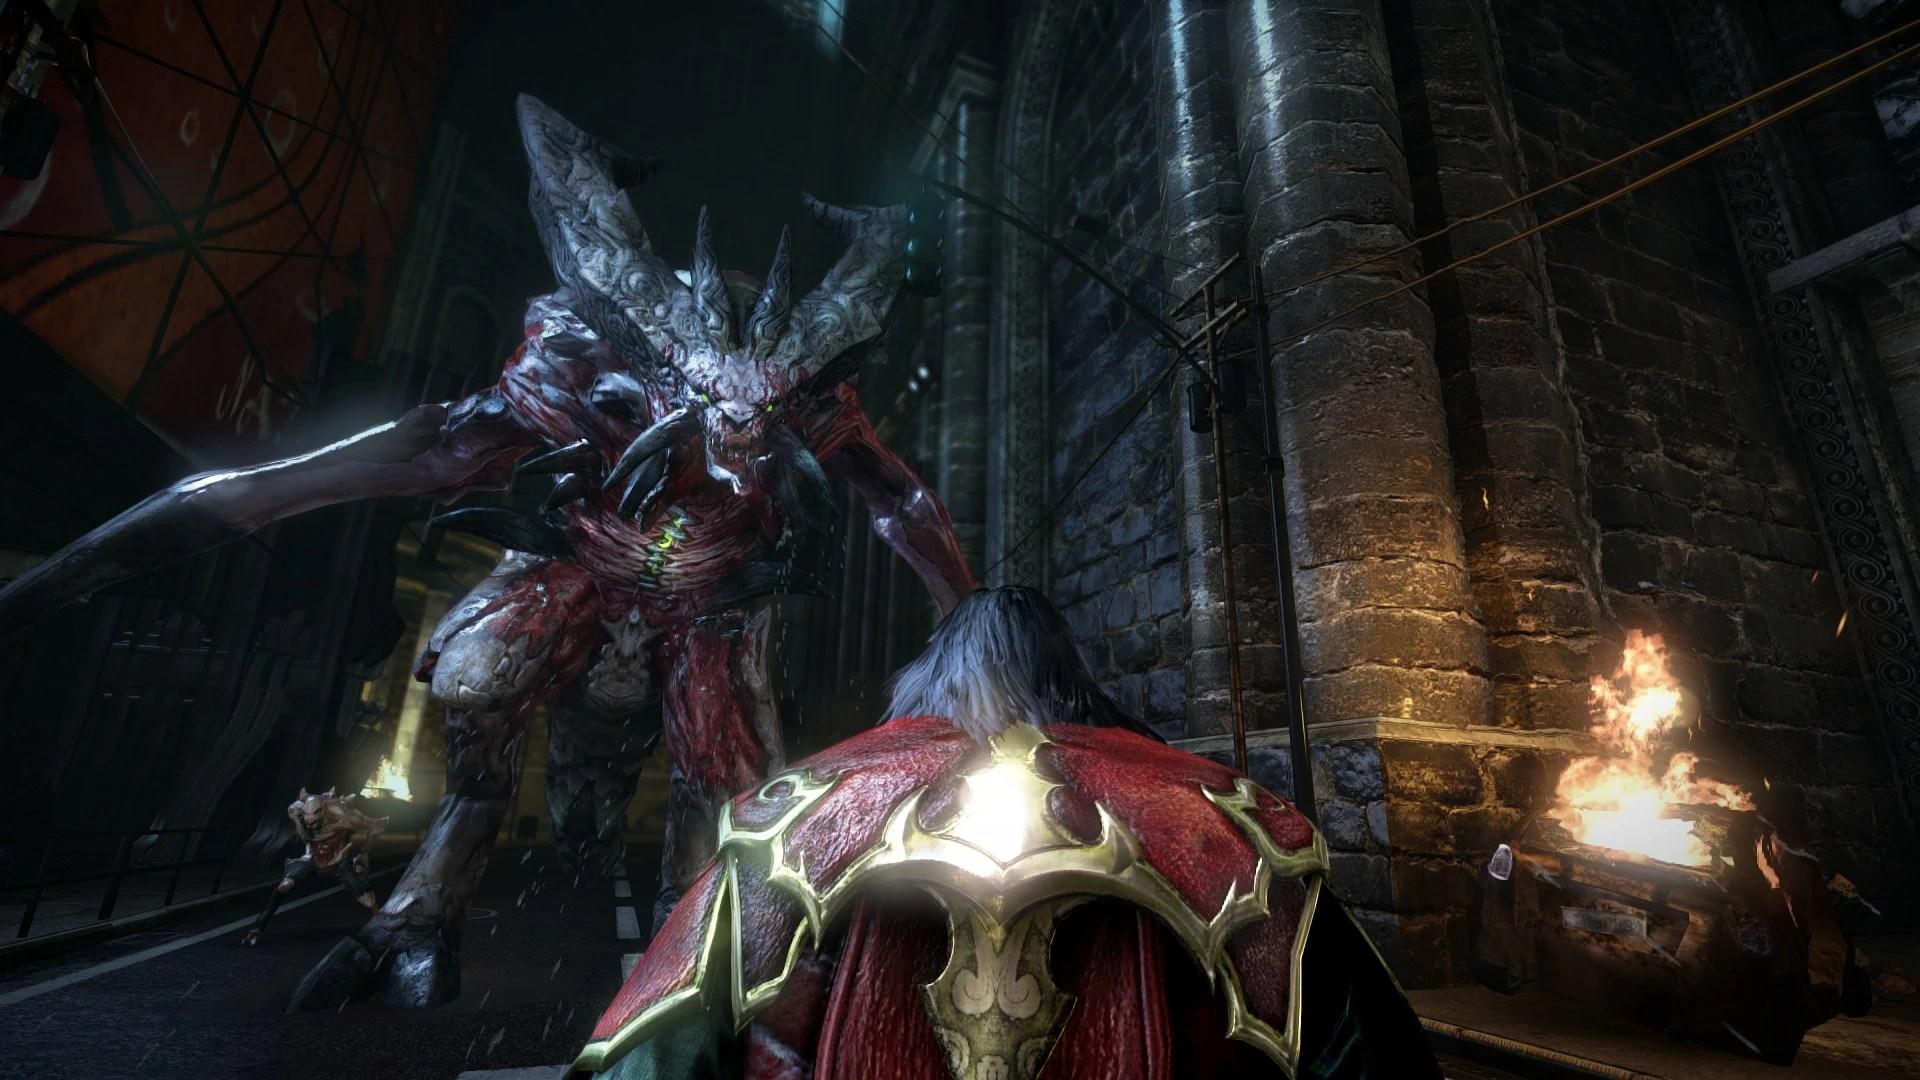 Mass Effect Animated Wallpaper Horned Demon Castlevania Wiki Fandom Powered By Wikia